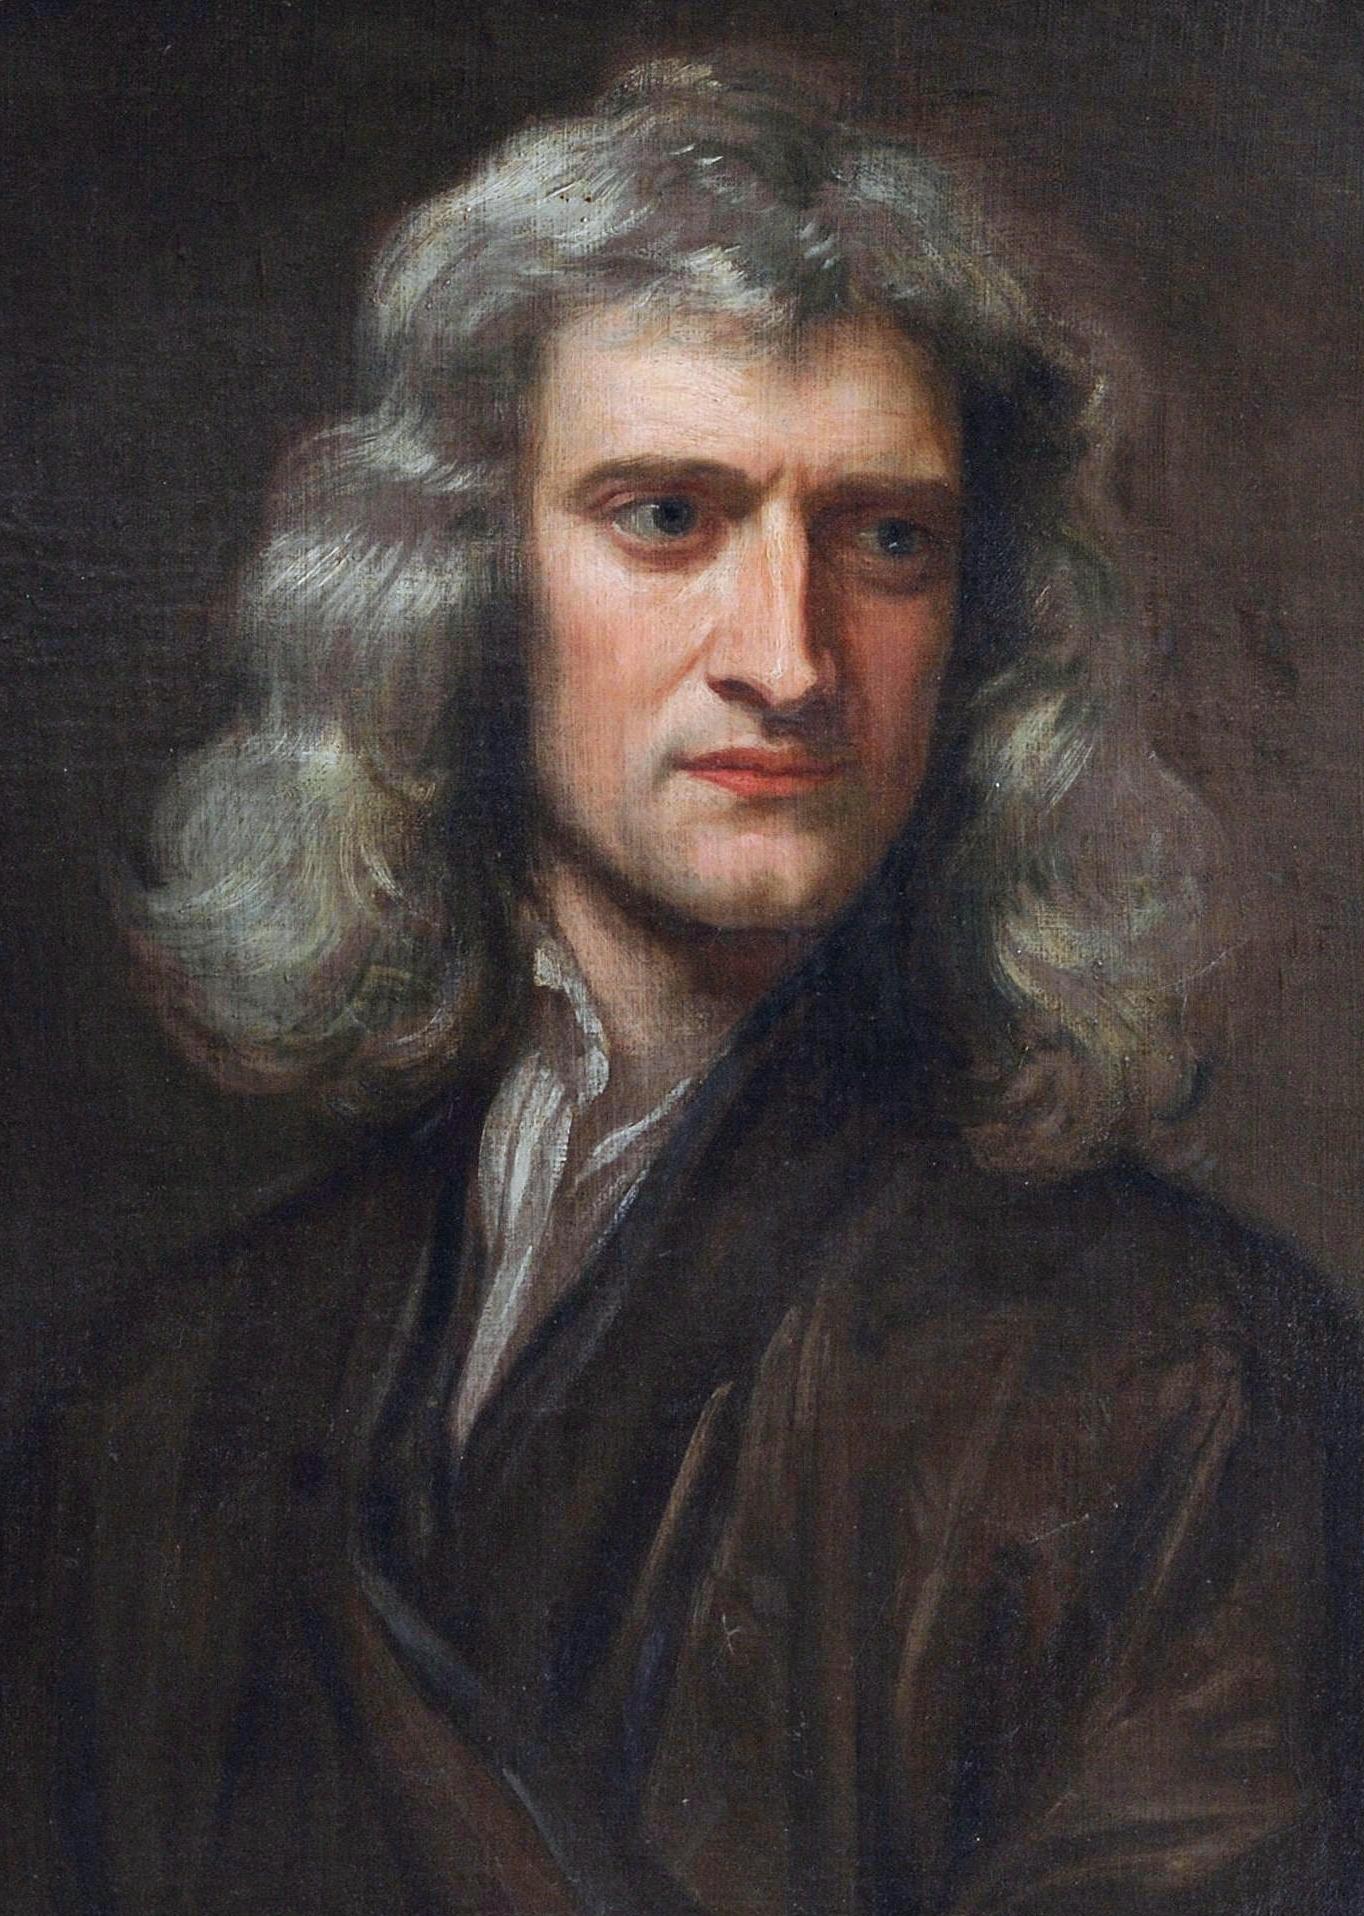 http://upload.wikimedia.org/wikipedia/commons/3/39/GodfreyKneller-IsaacNewton-1689.jpg